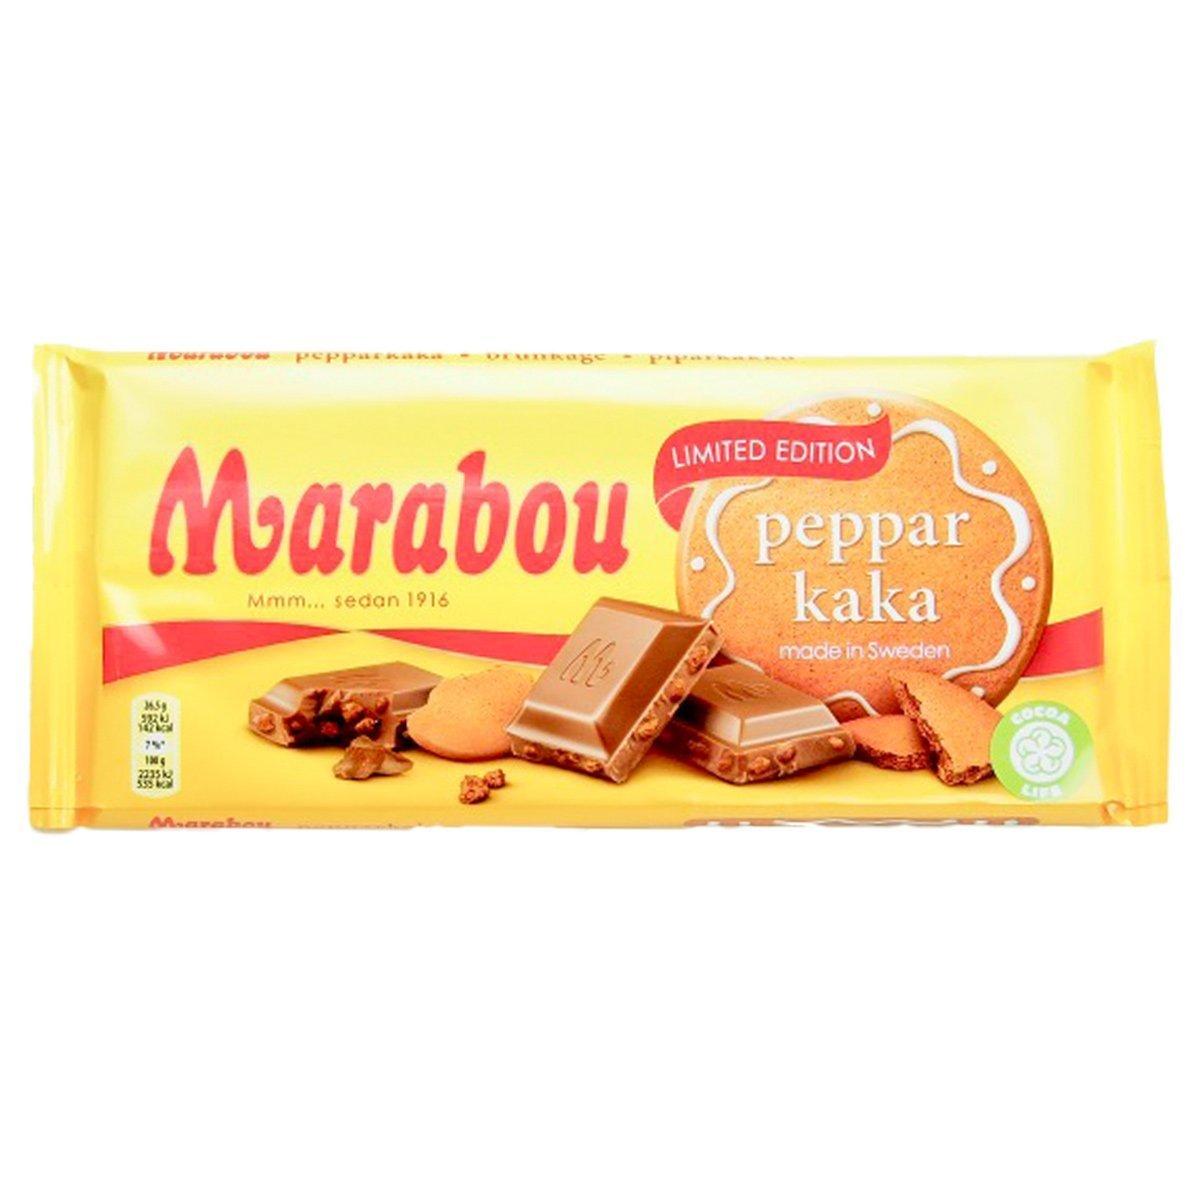 Marabou pepparkaka (185g) 1